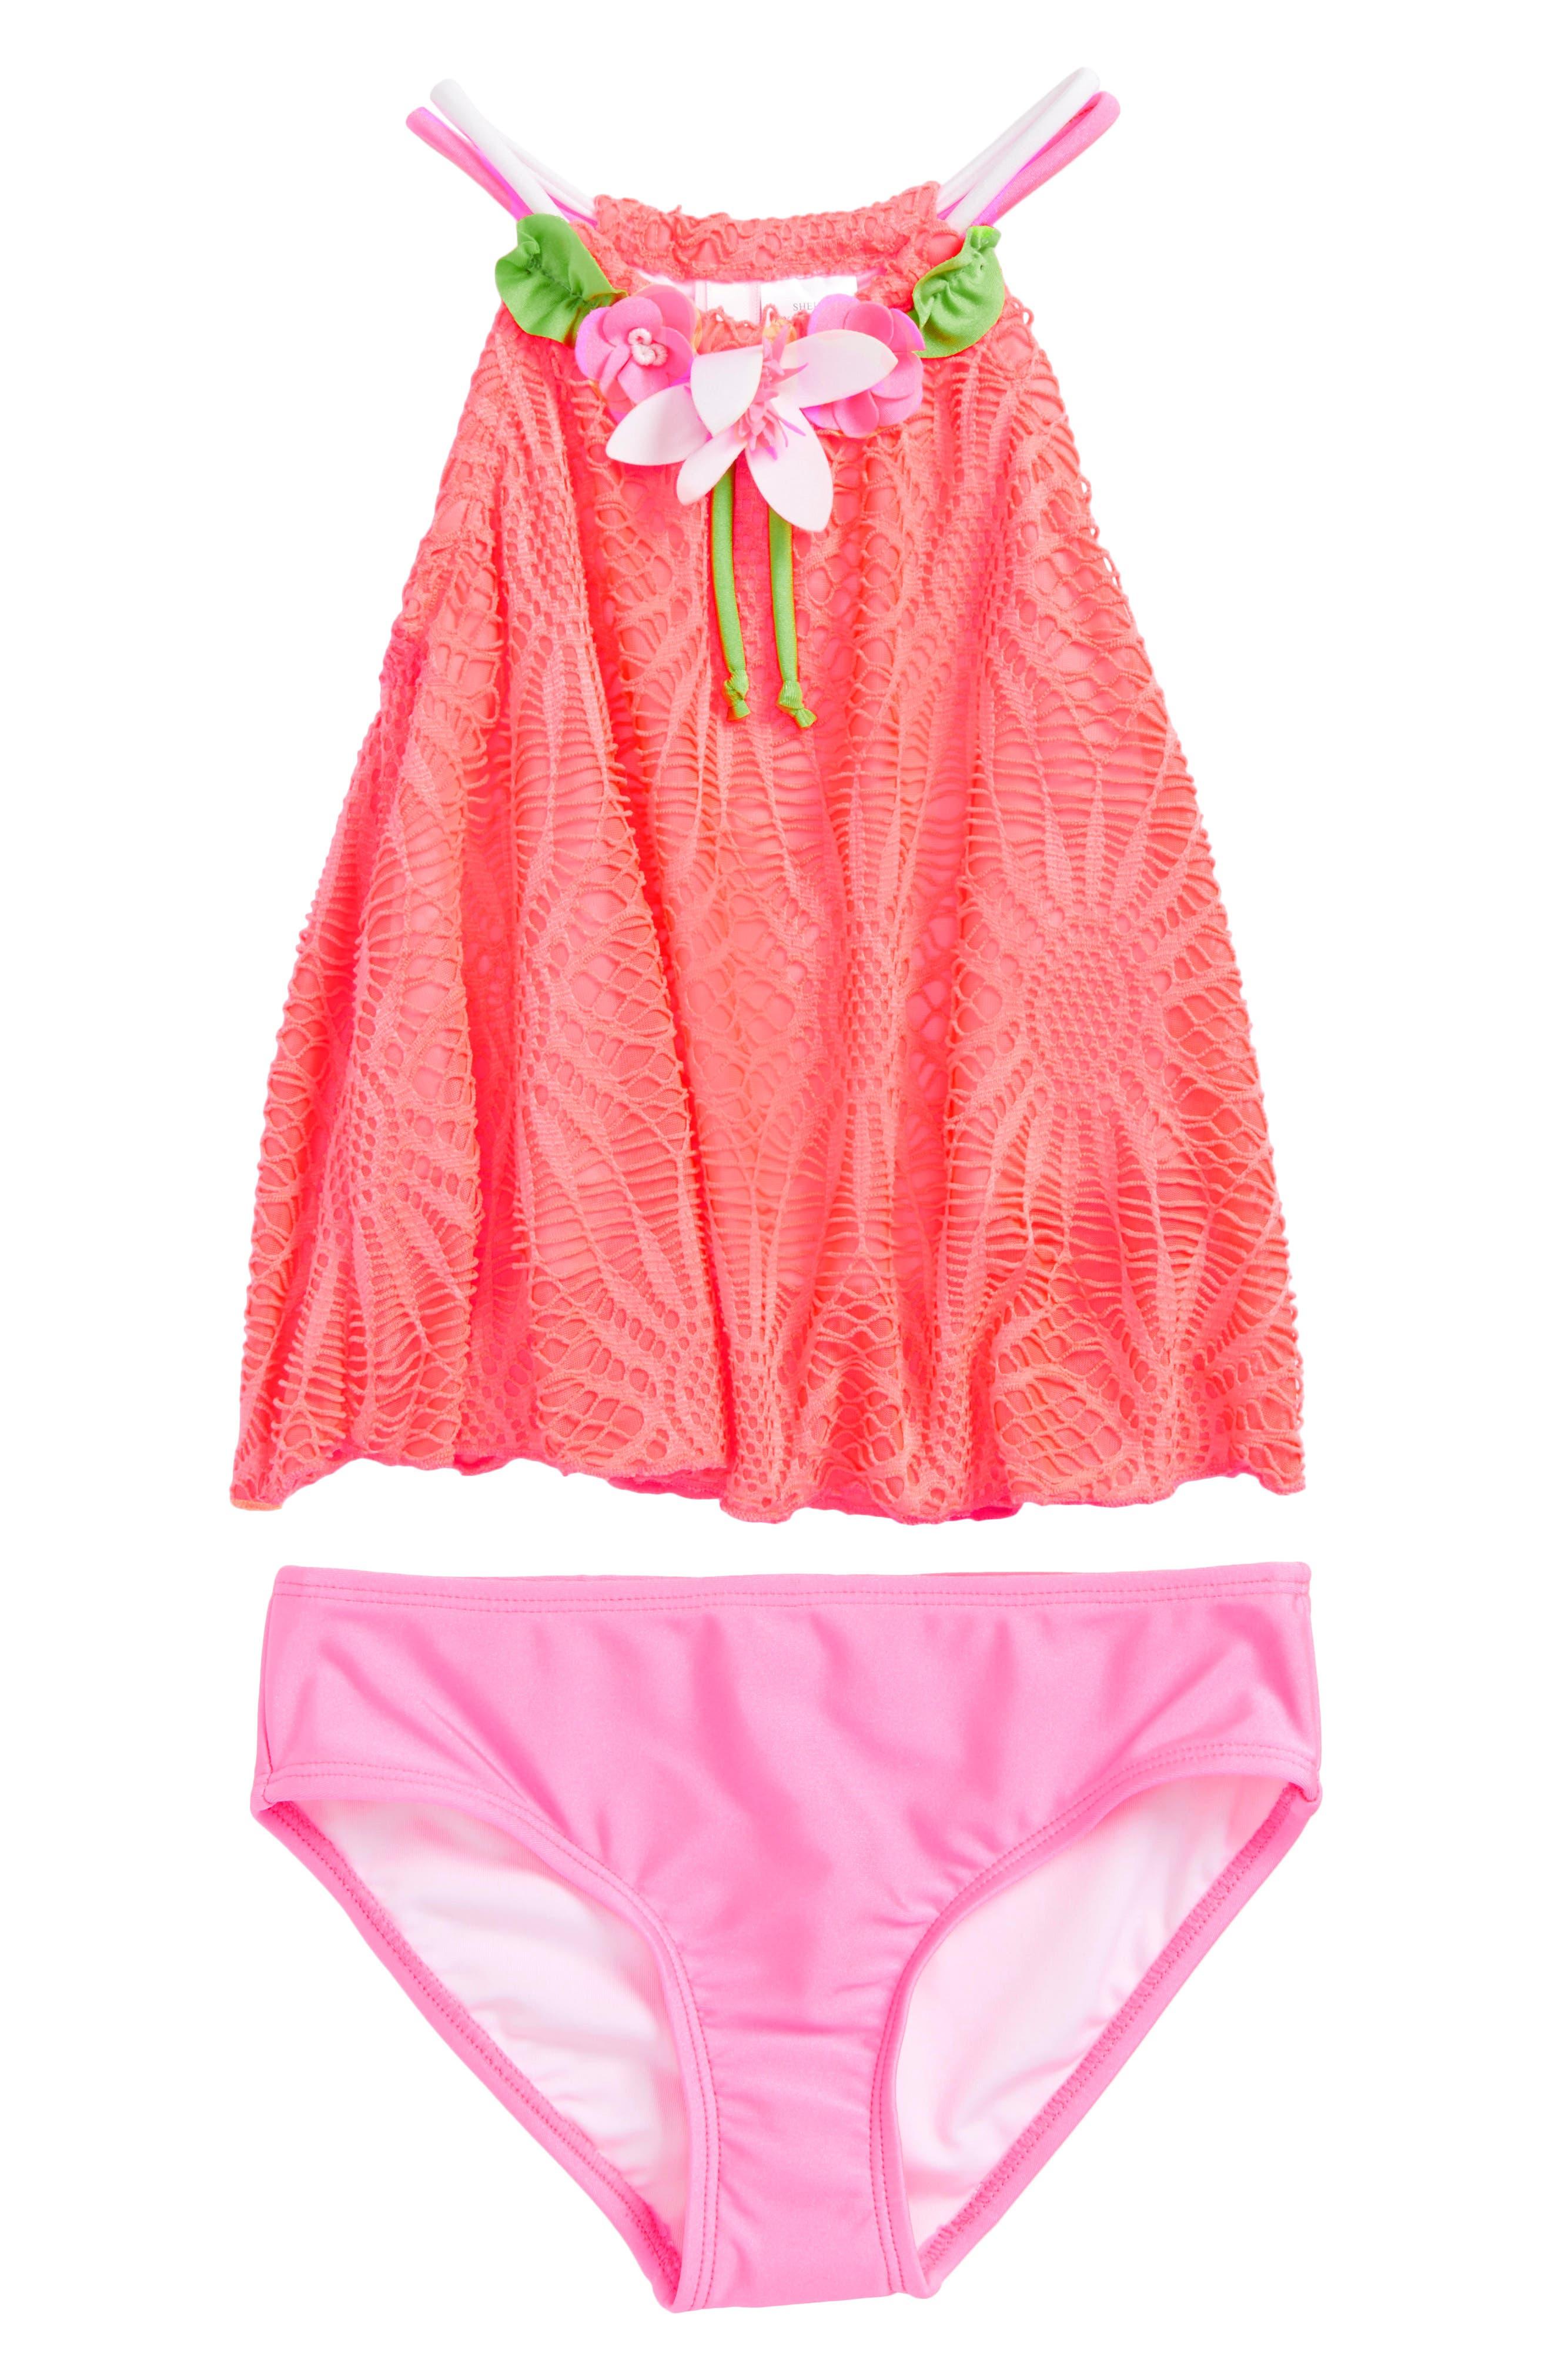 Main Image - Love U Lots Crochet Tankini Two-Piece Swimsuit (Toddler Girls & Little Girls)